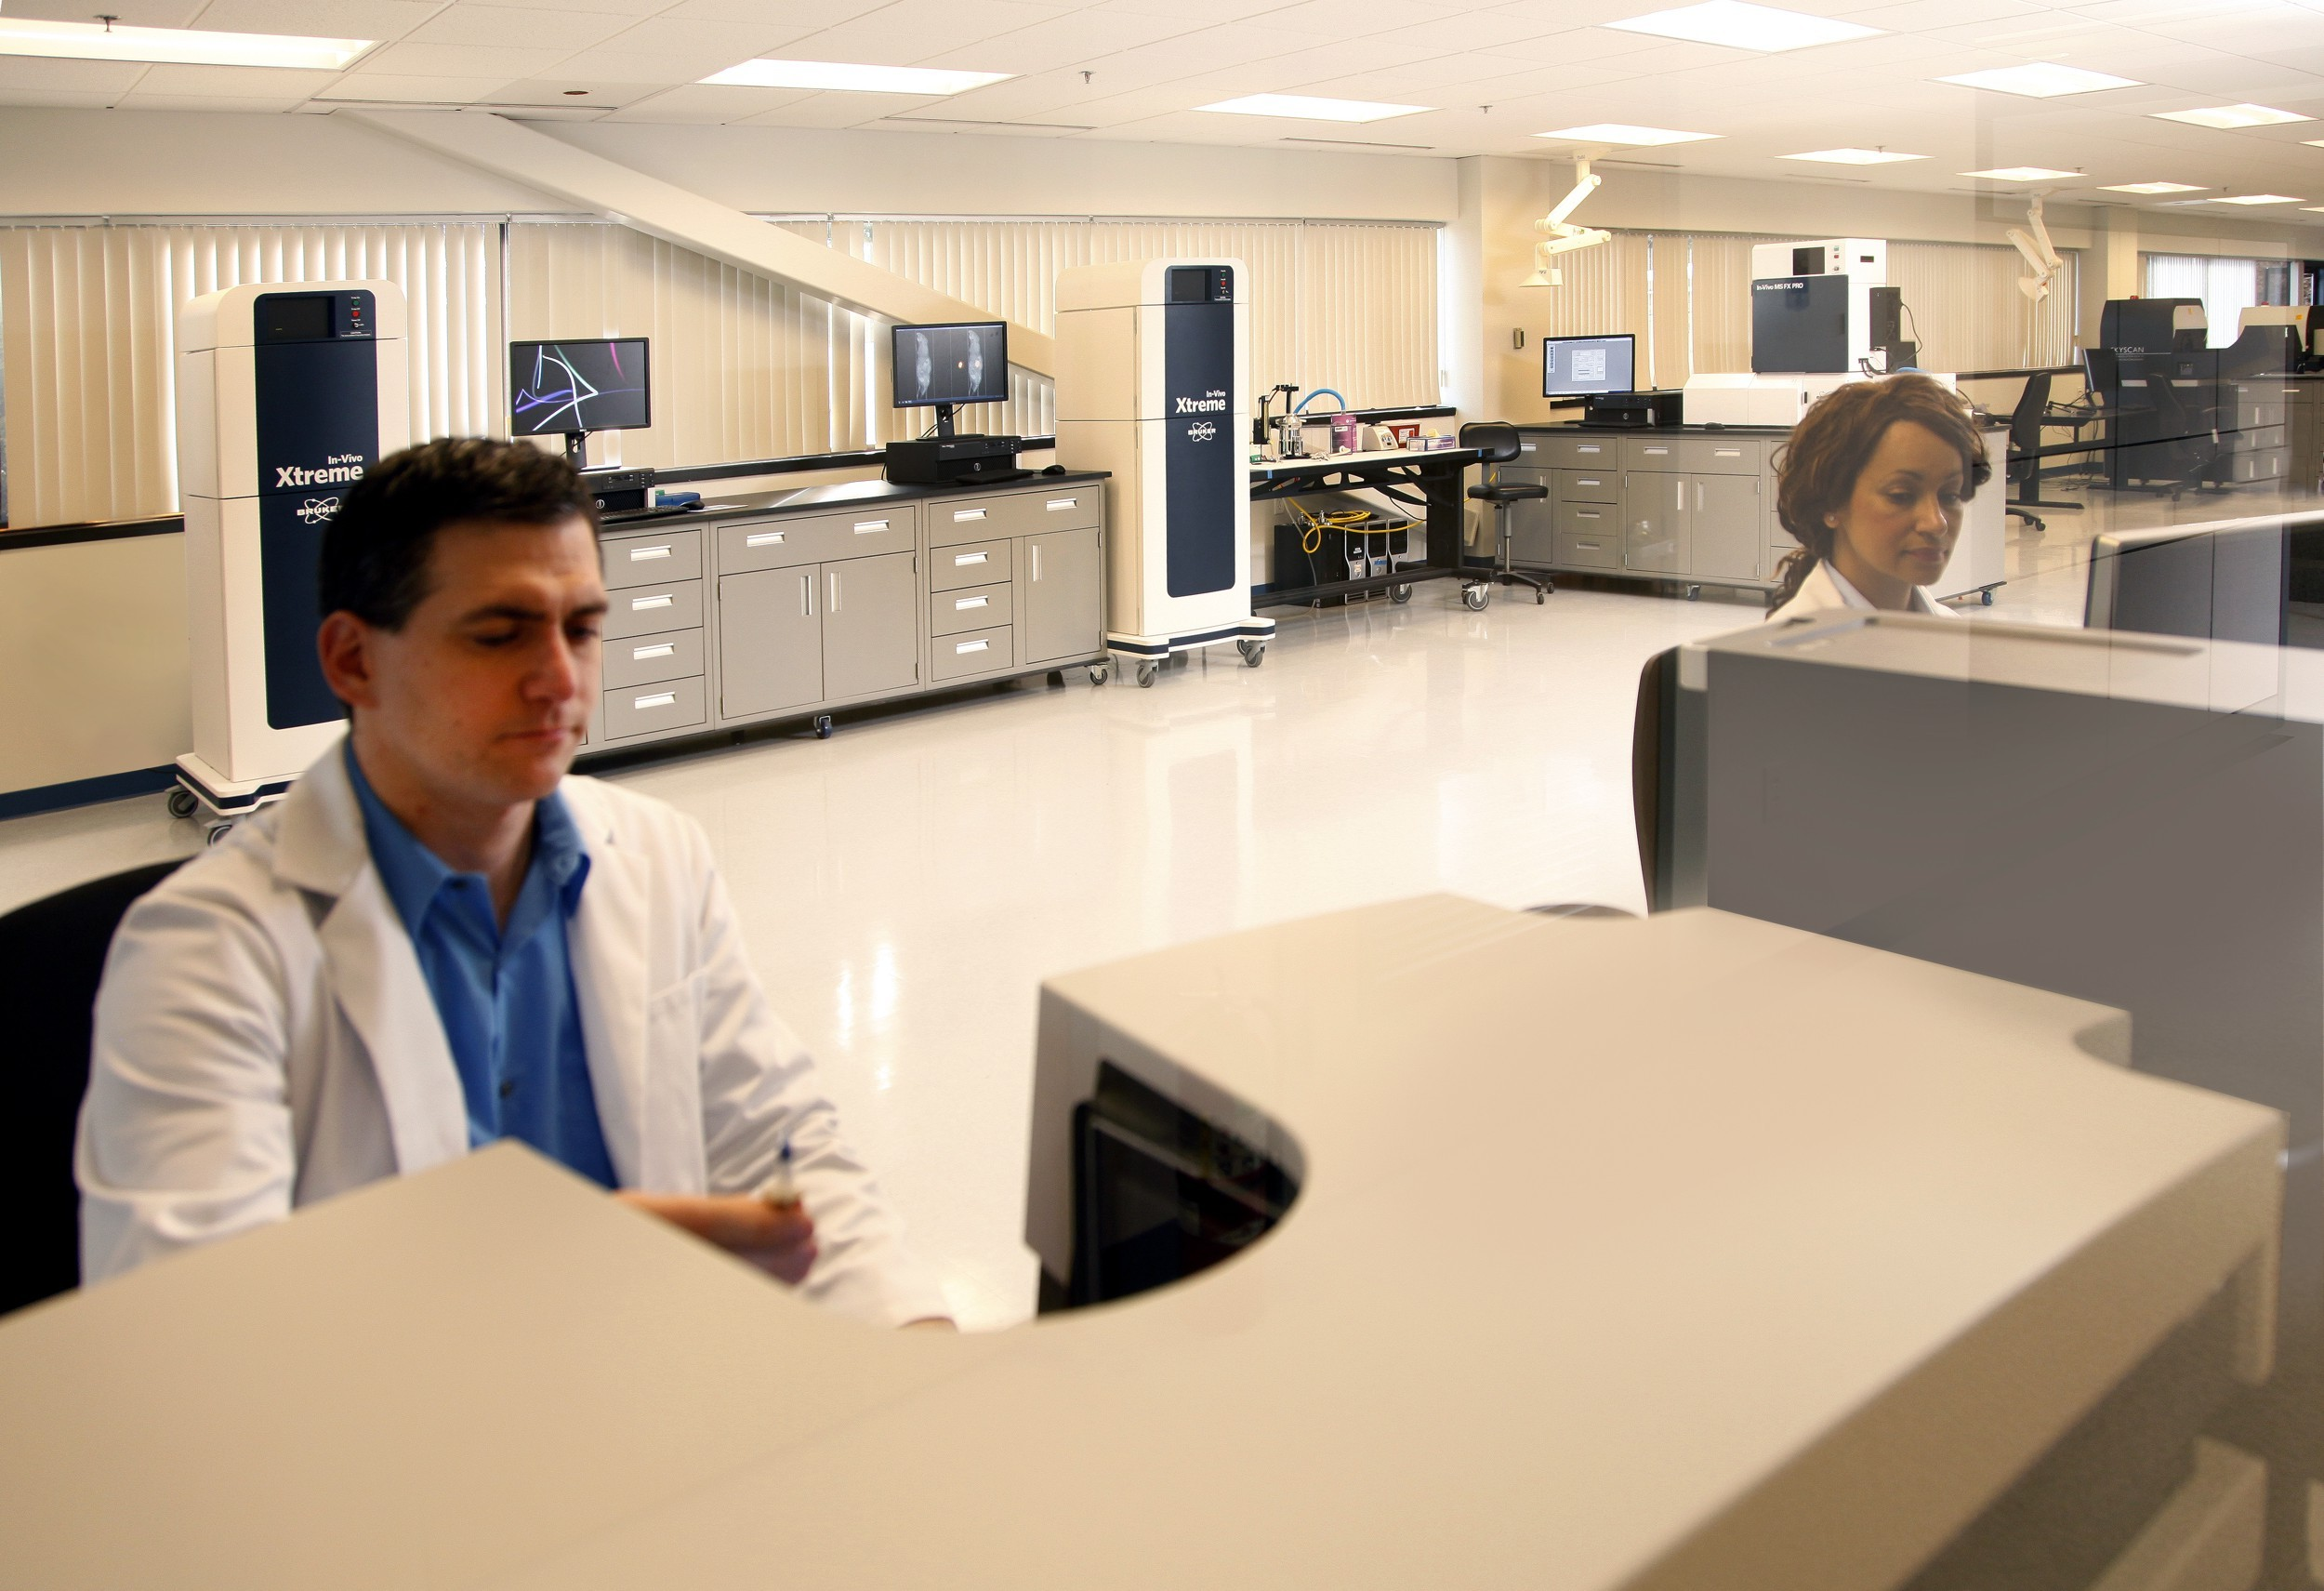 Bruker's new preclinical imaging Center of Excellence in Billerica, Massachusetts (Photo: Business Wire)